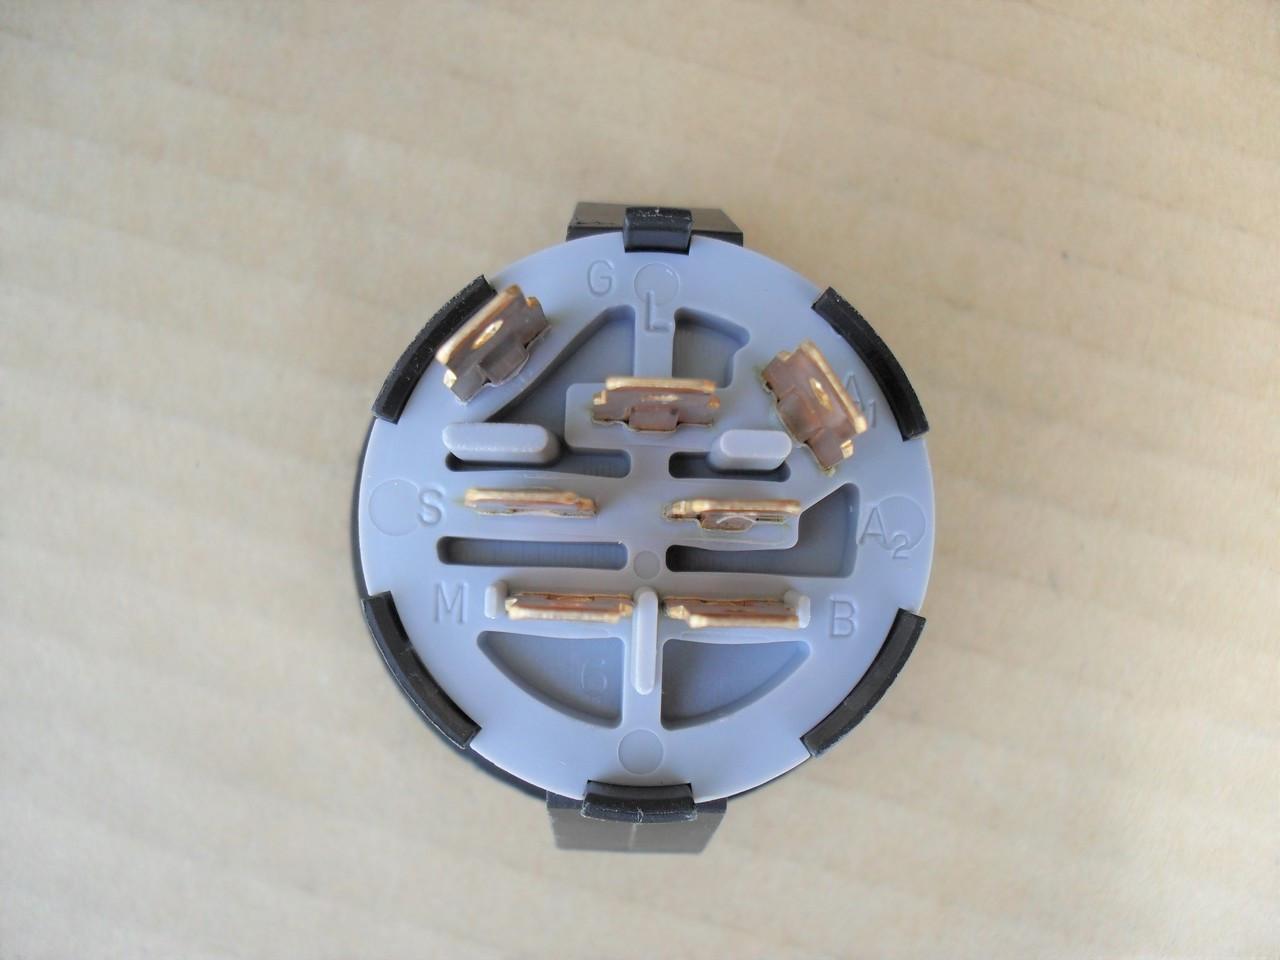 delta lawn mower ignition starter switch 690047p 6900 47p  [ 1280 x 960 Pixel ]